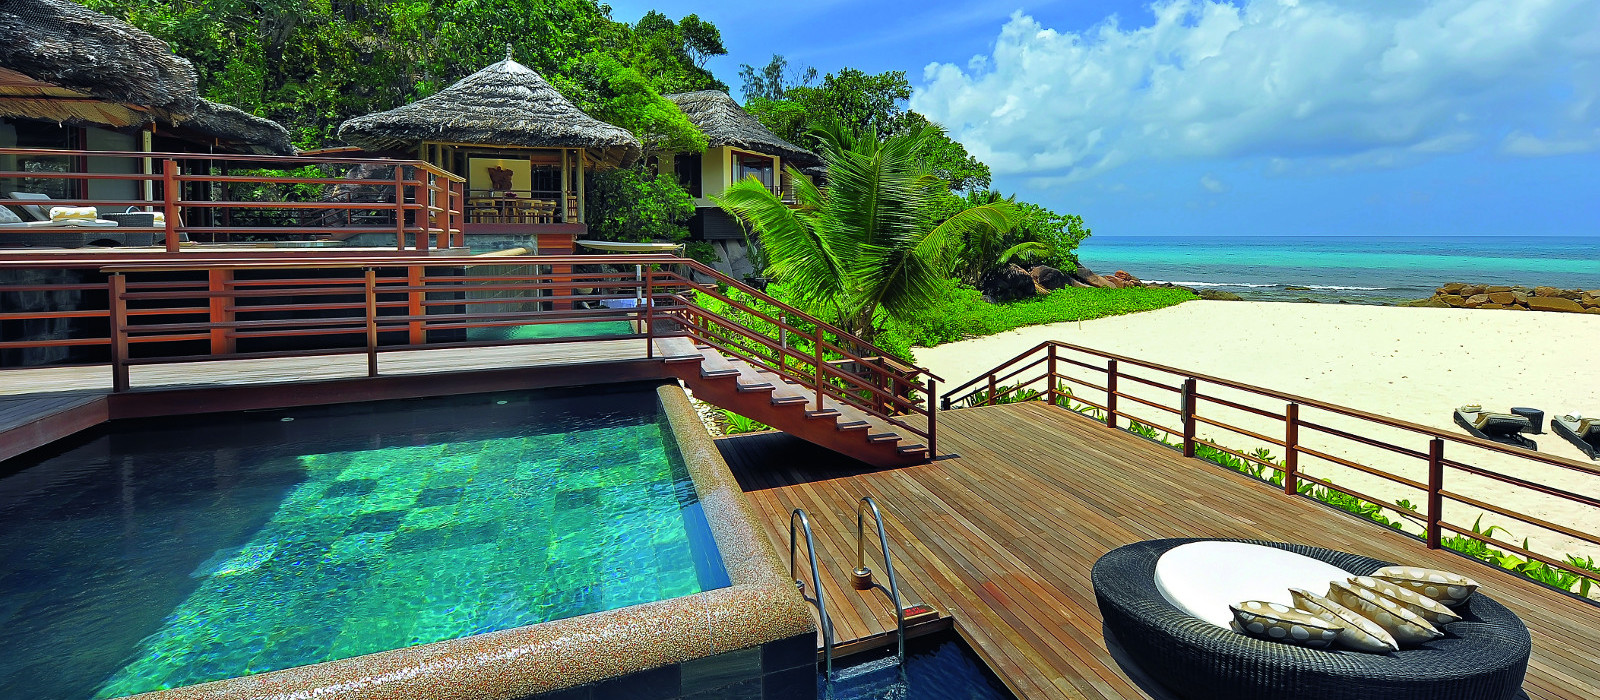 Seychelles Island Paradises Tour Trip 1